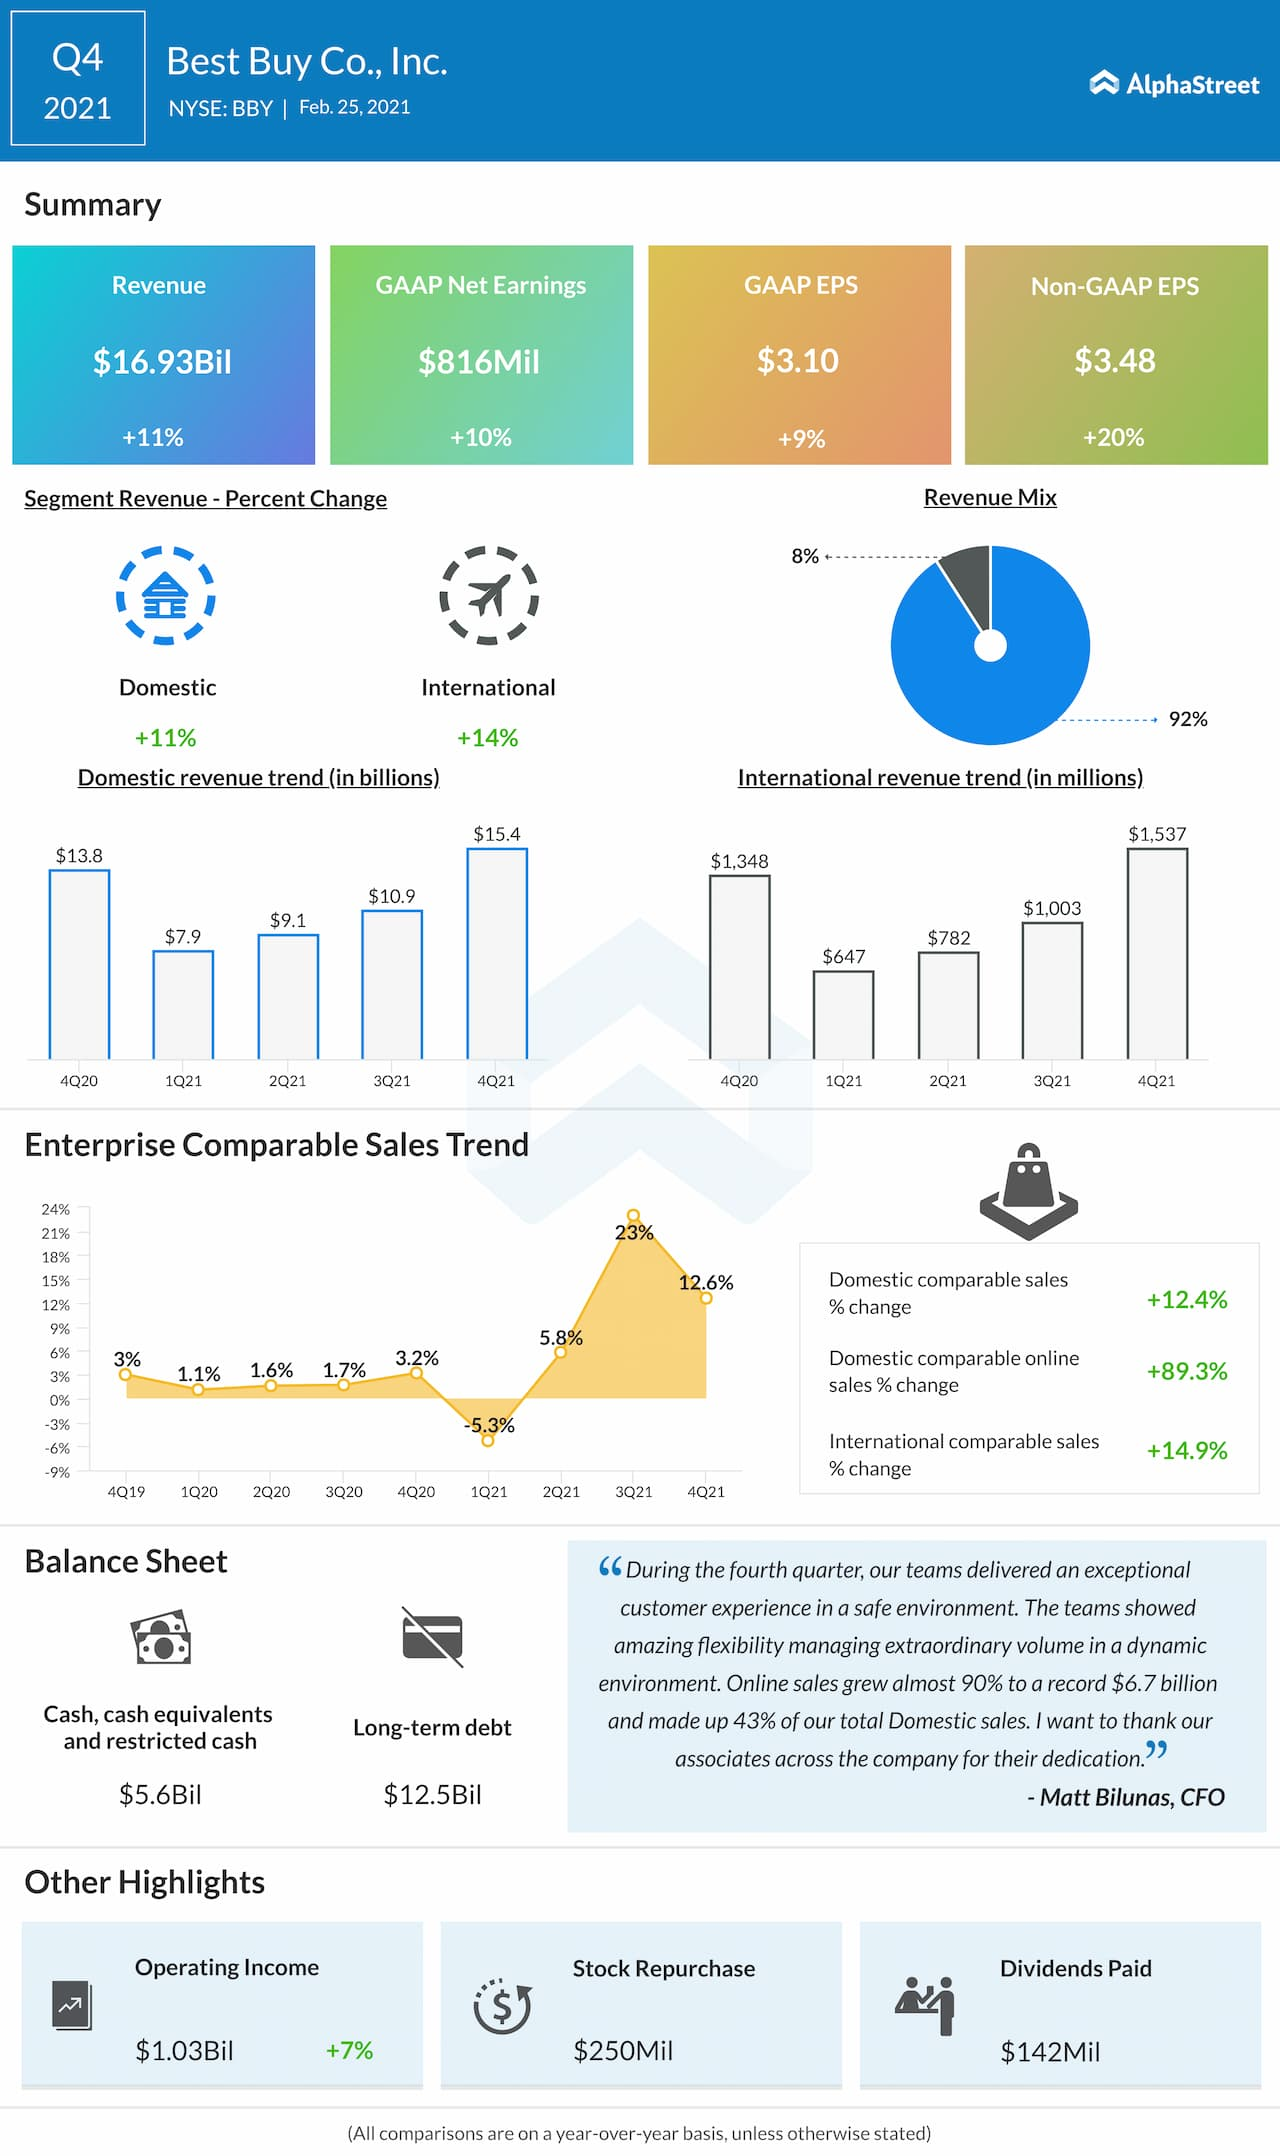 Best Buy Q4 2021 earnings infographic